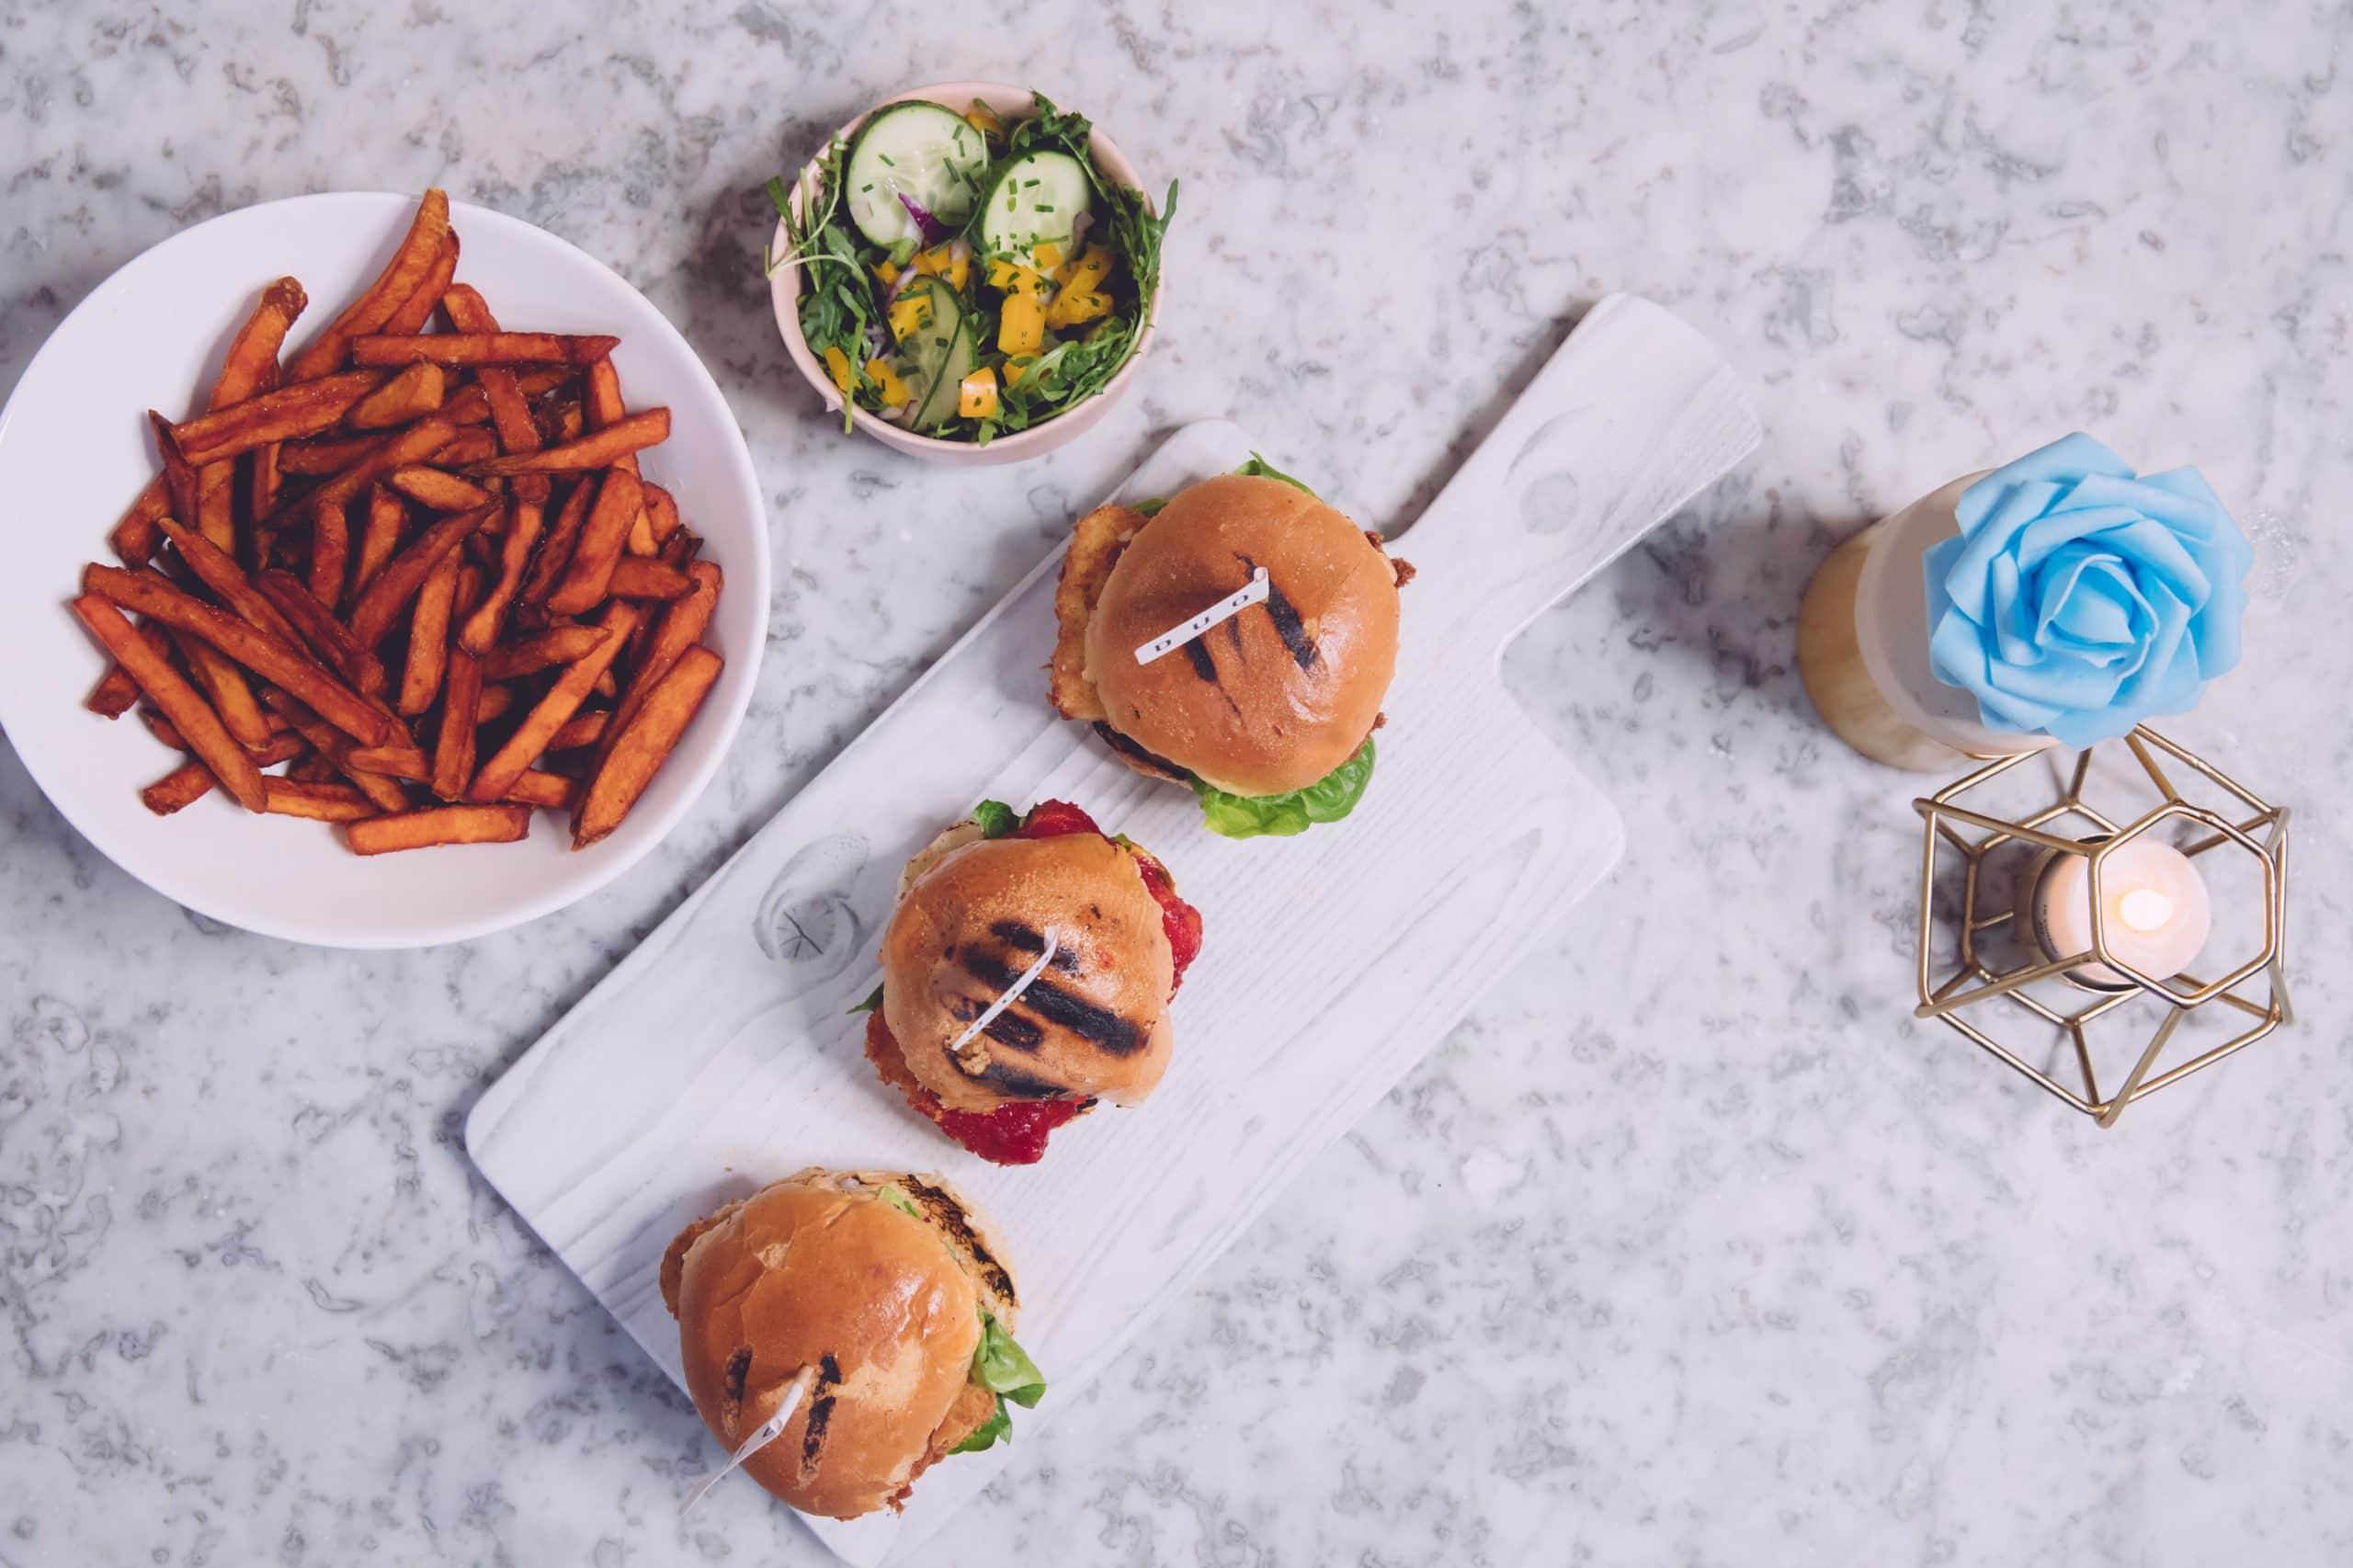 food photography at Duo London